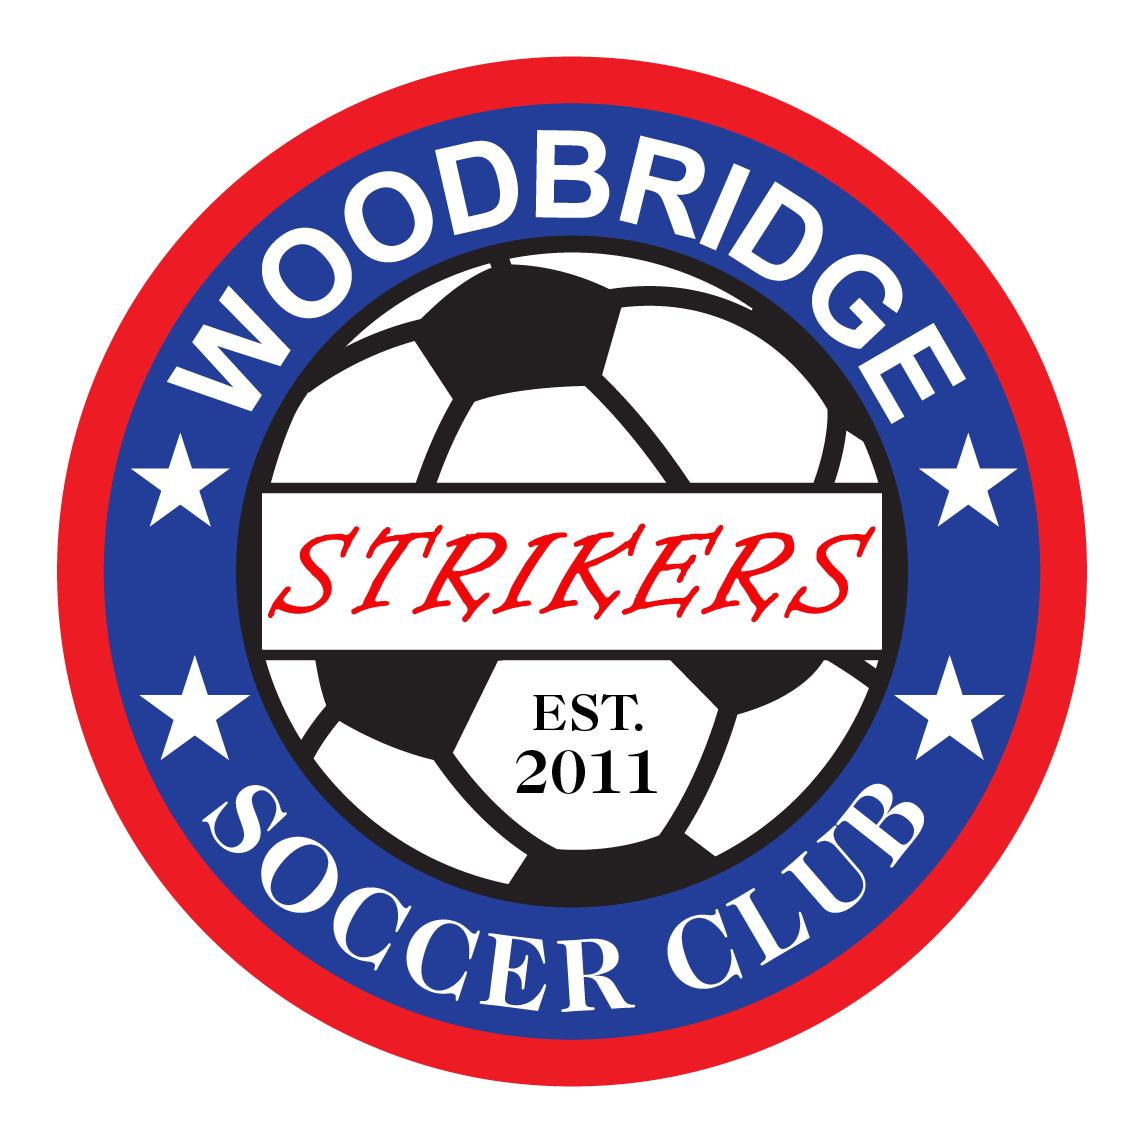 woodbridge-strikers header logo2